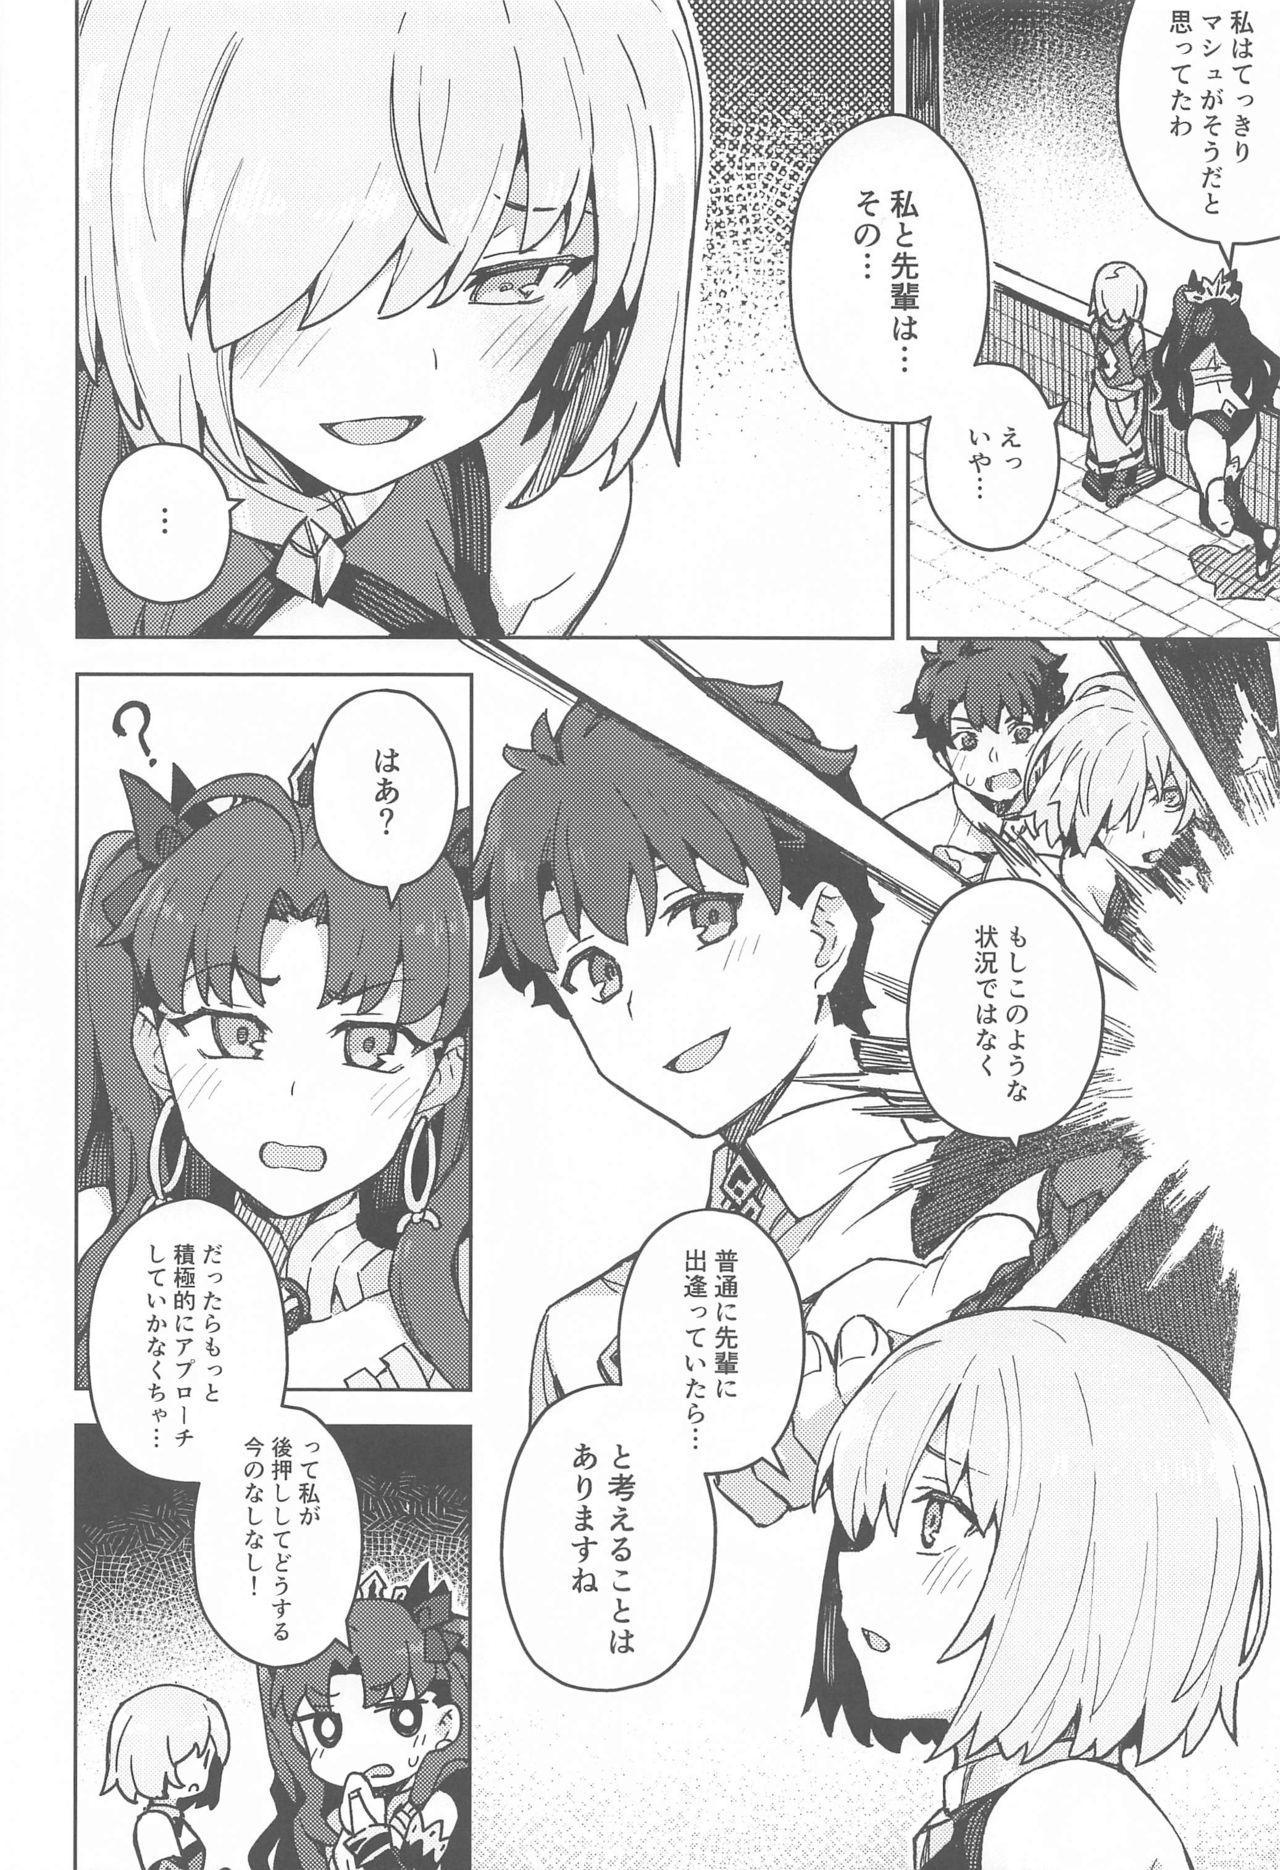 Da Megami Chuuihou 2